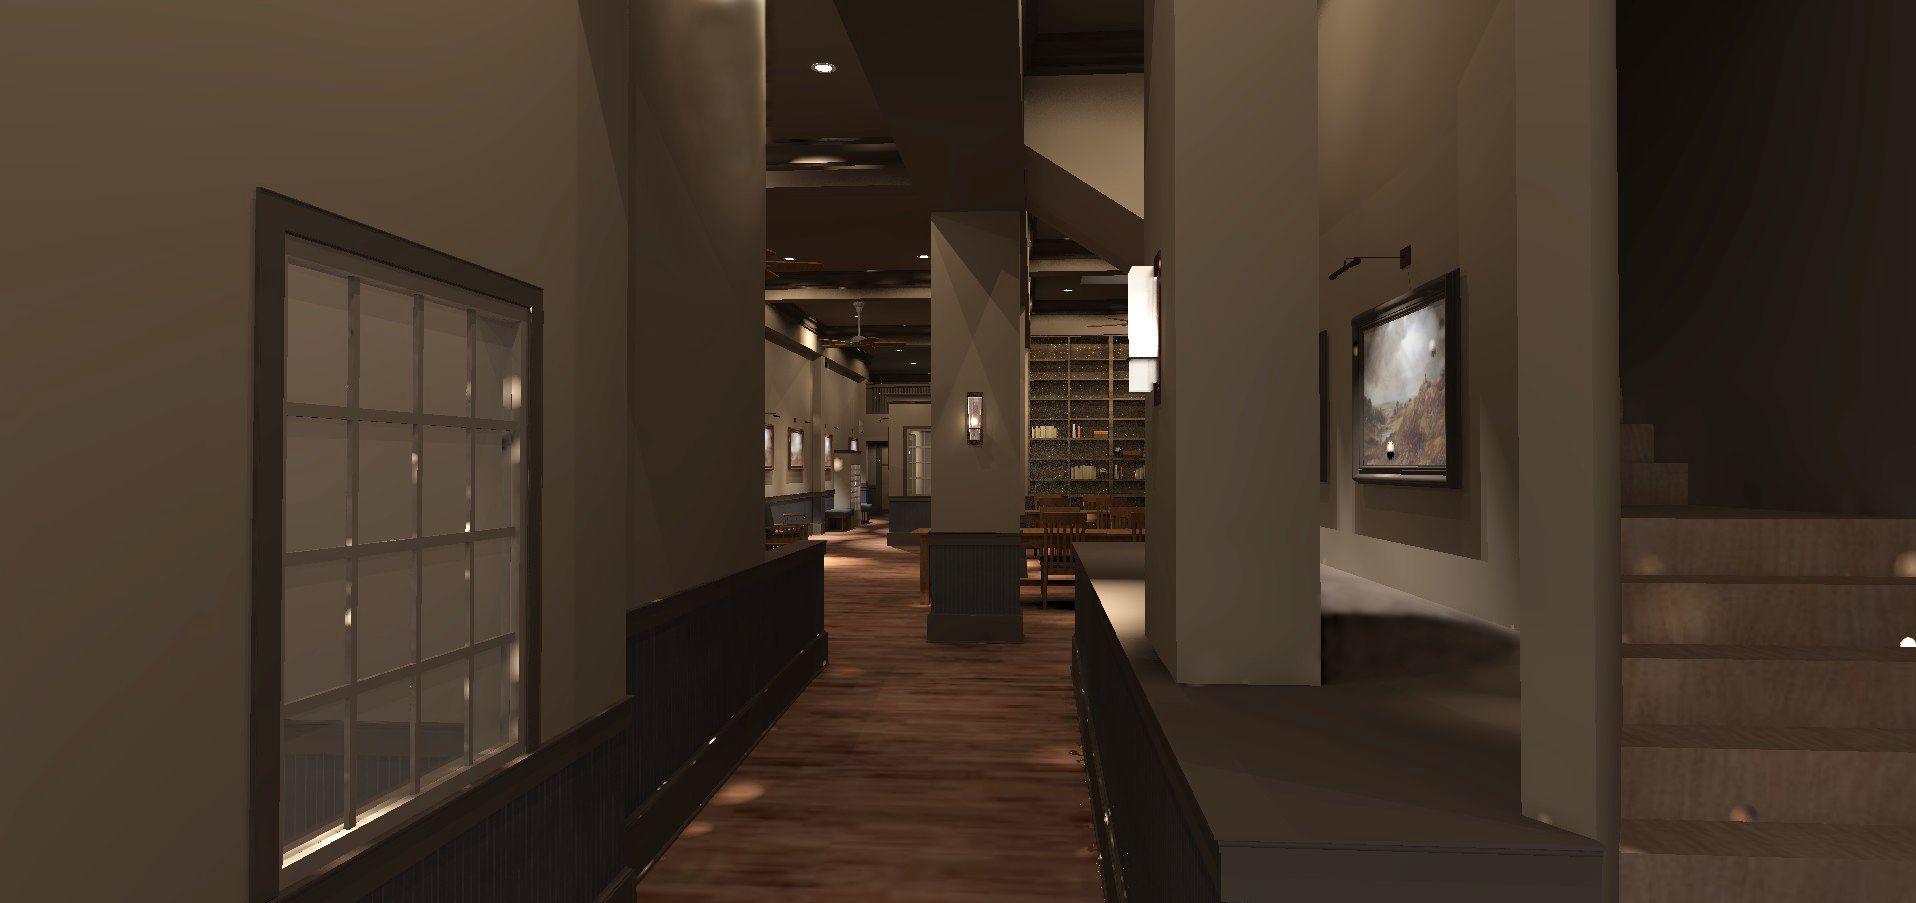 Belvue-lobby-image-1